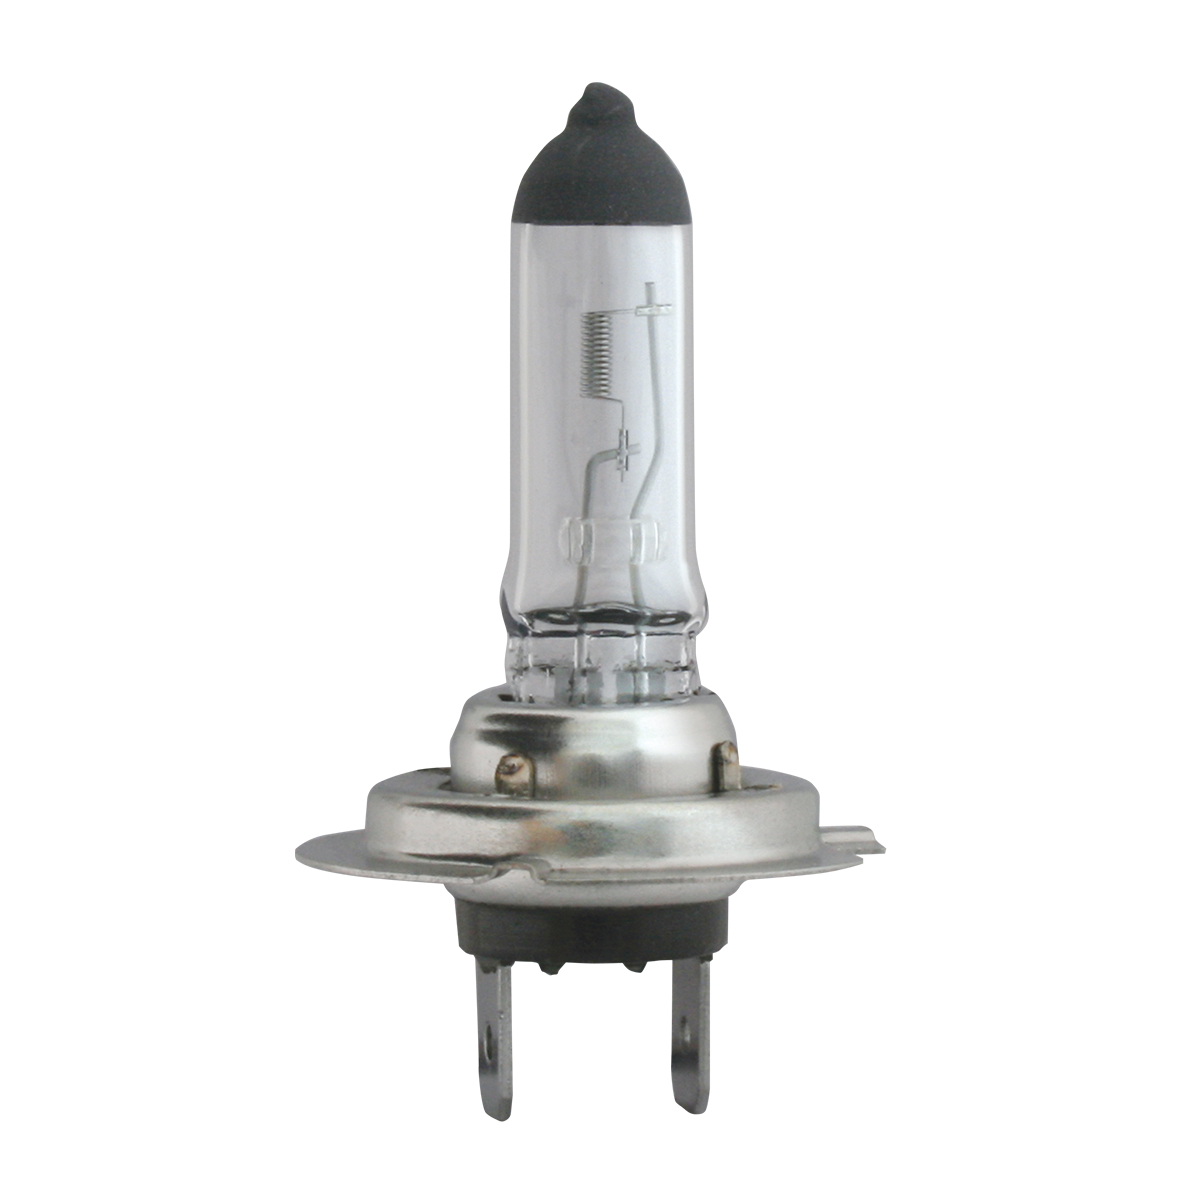 82056 H7 Headlight Halogen Bulb